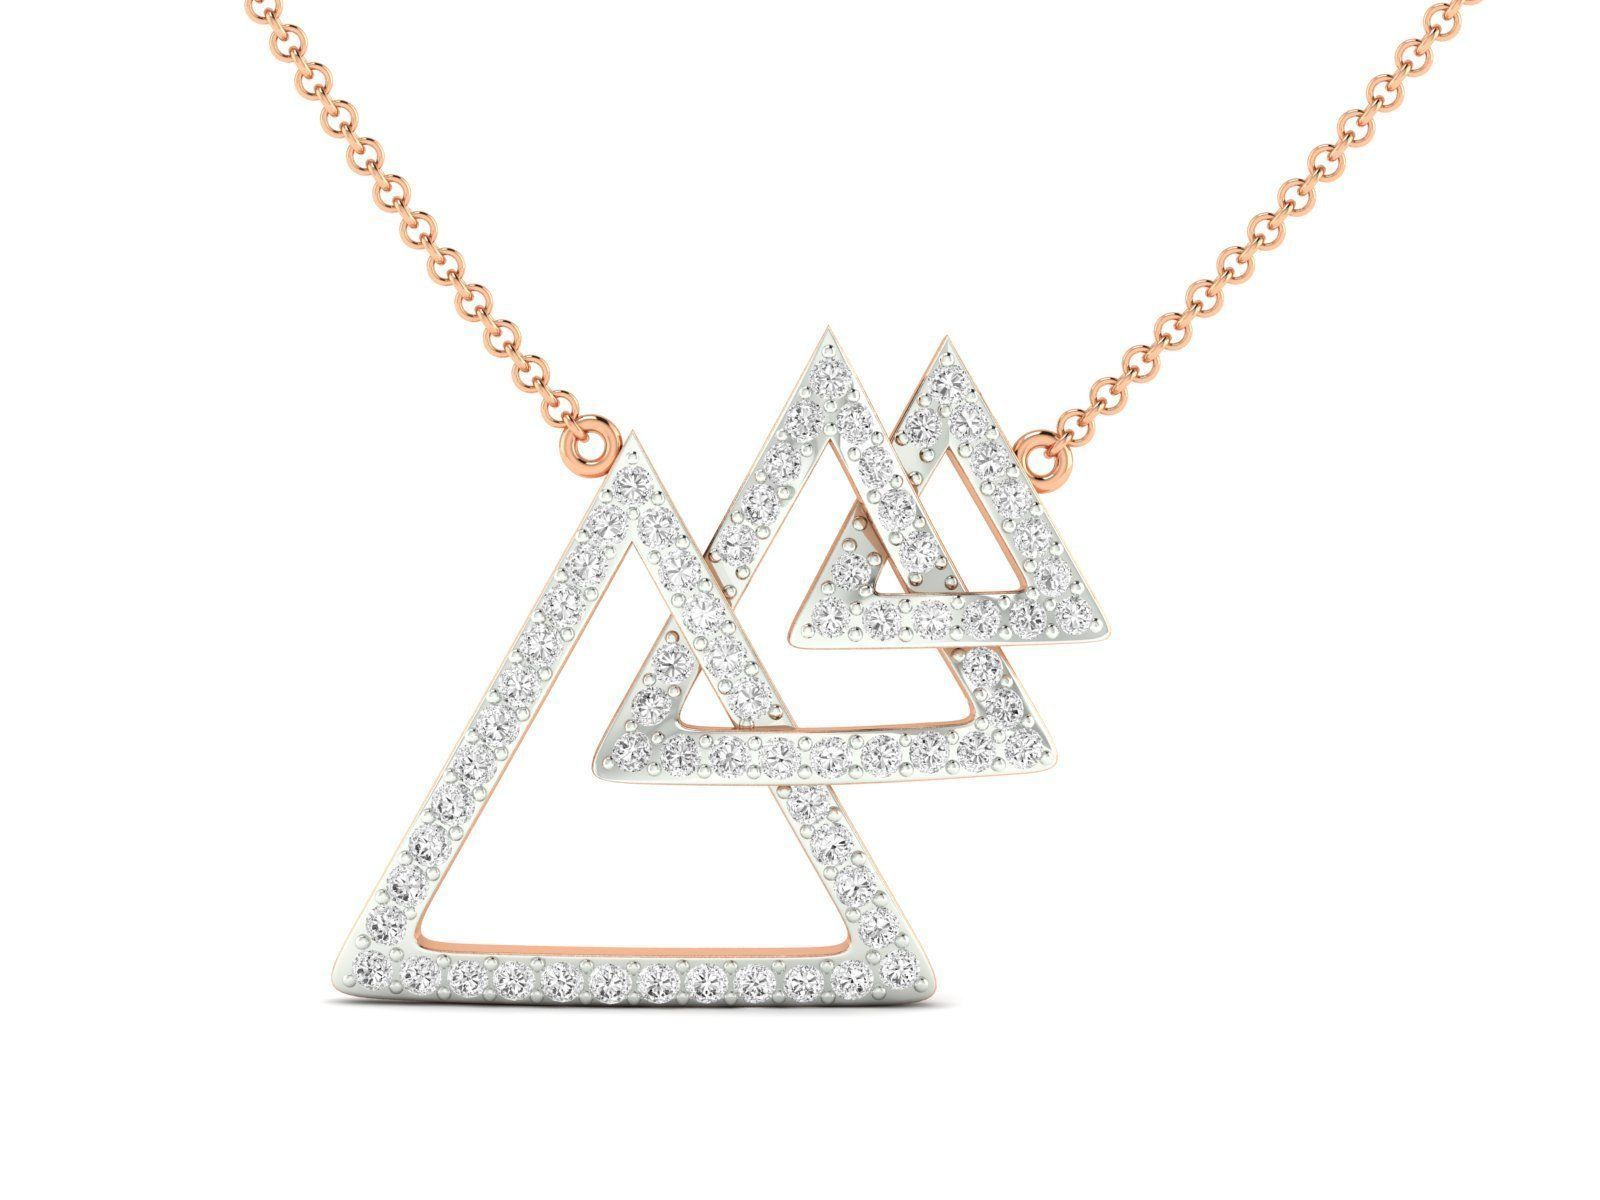 Women necklace 3dm stl render detail